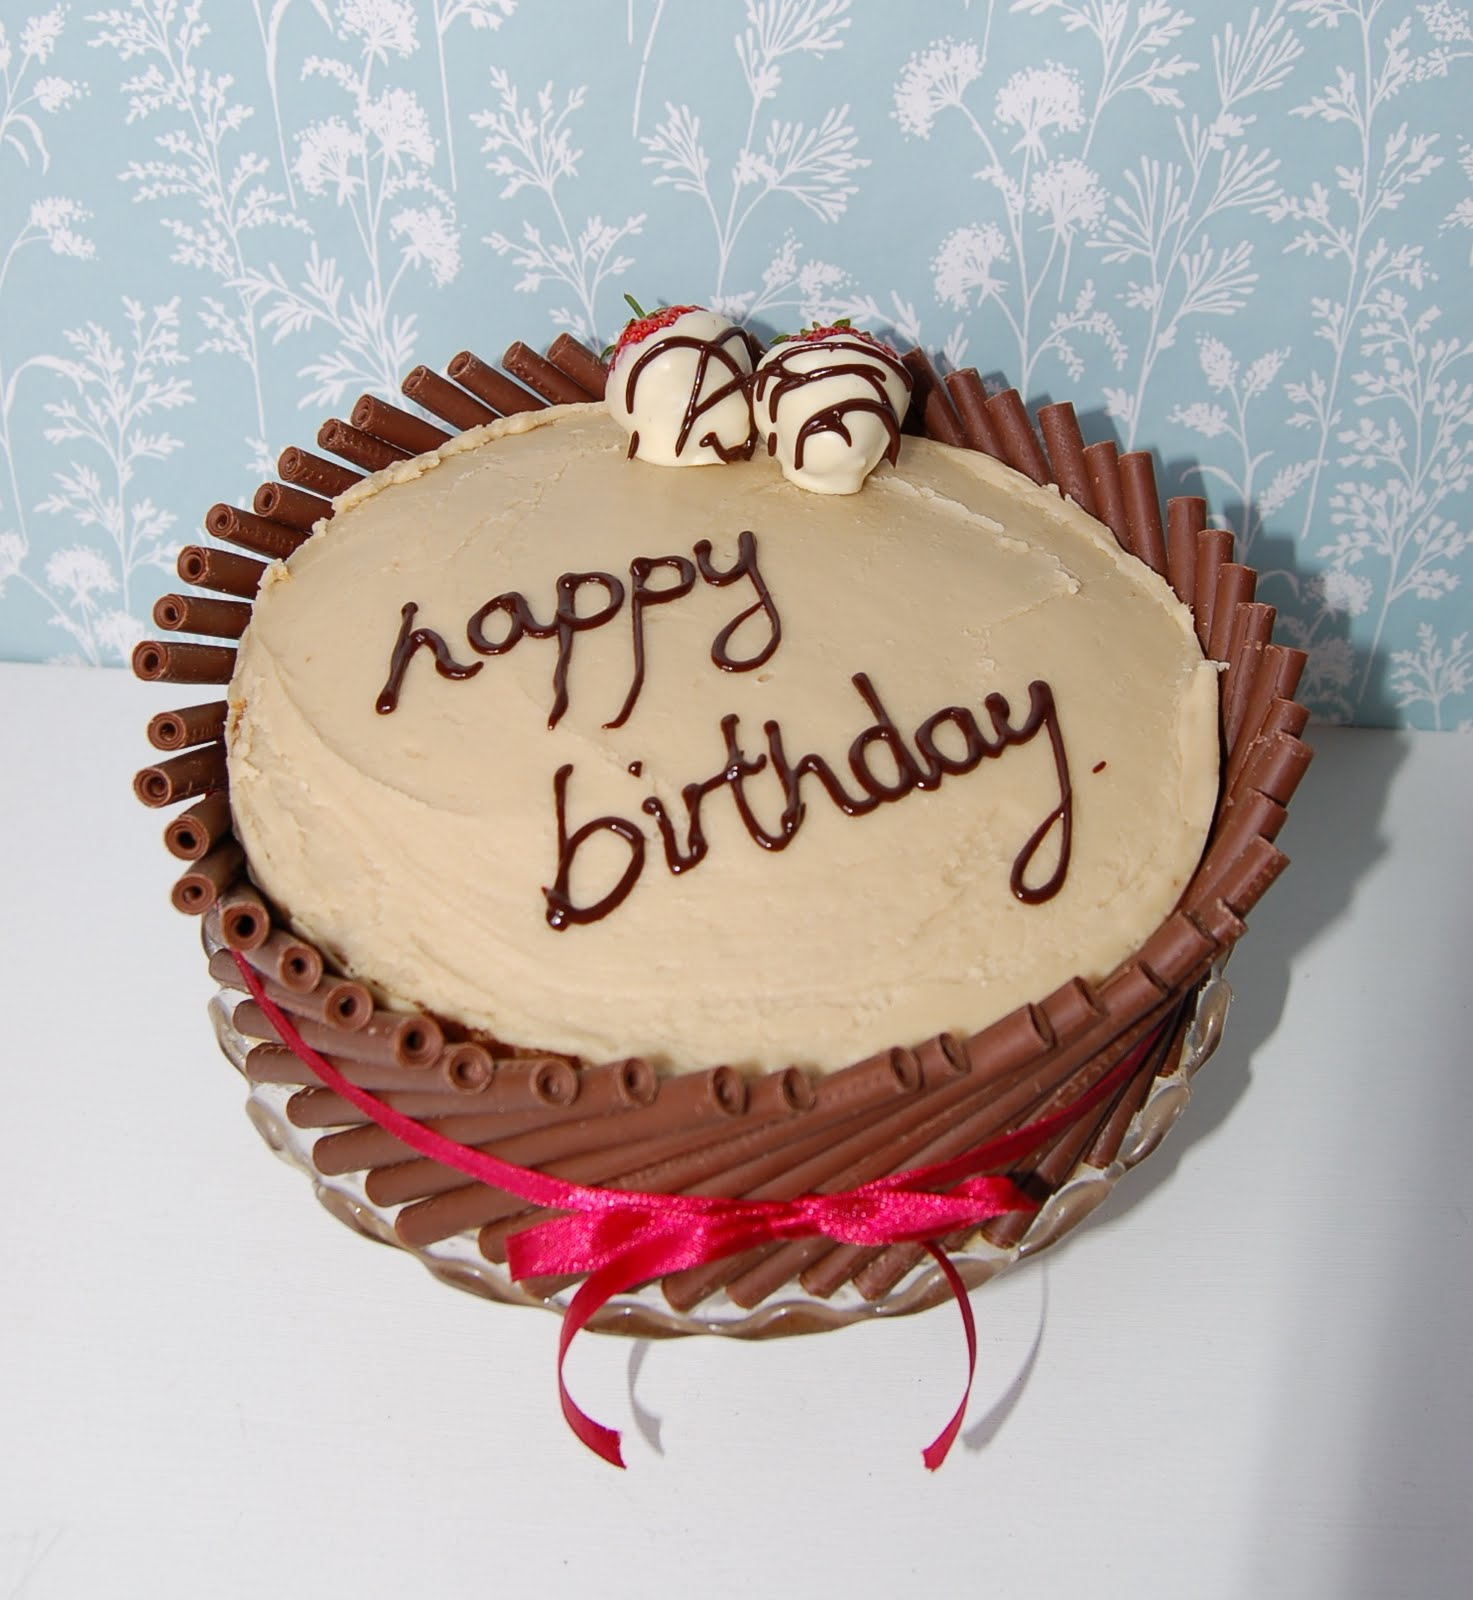 Brighton Baker Chocolate Cigarello Fudge Cake Happy Birthday Dad X